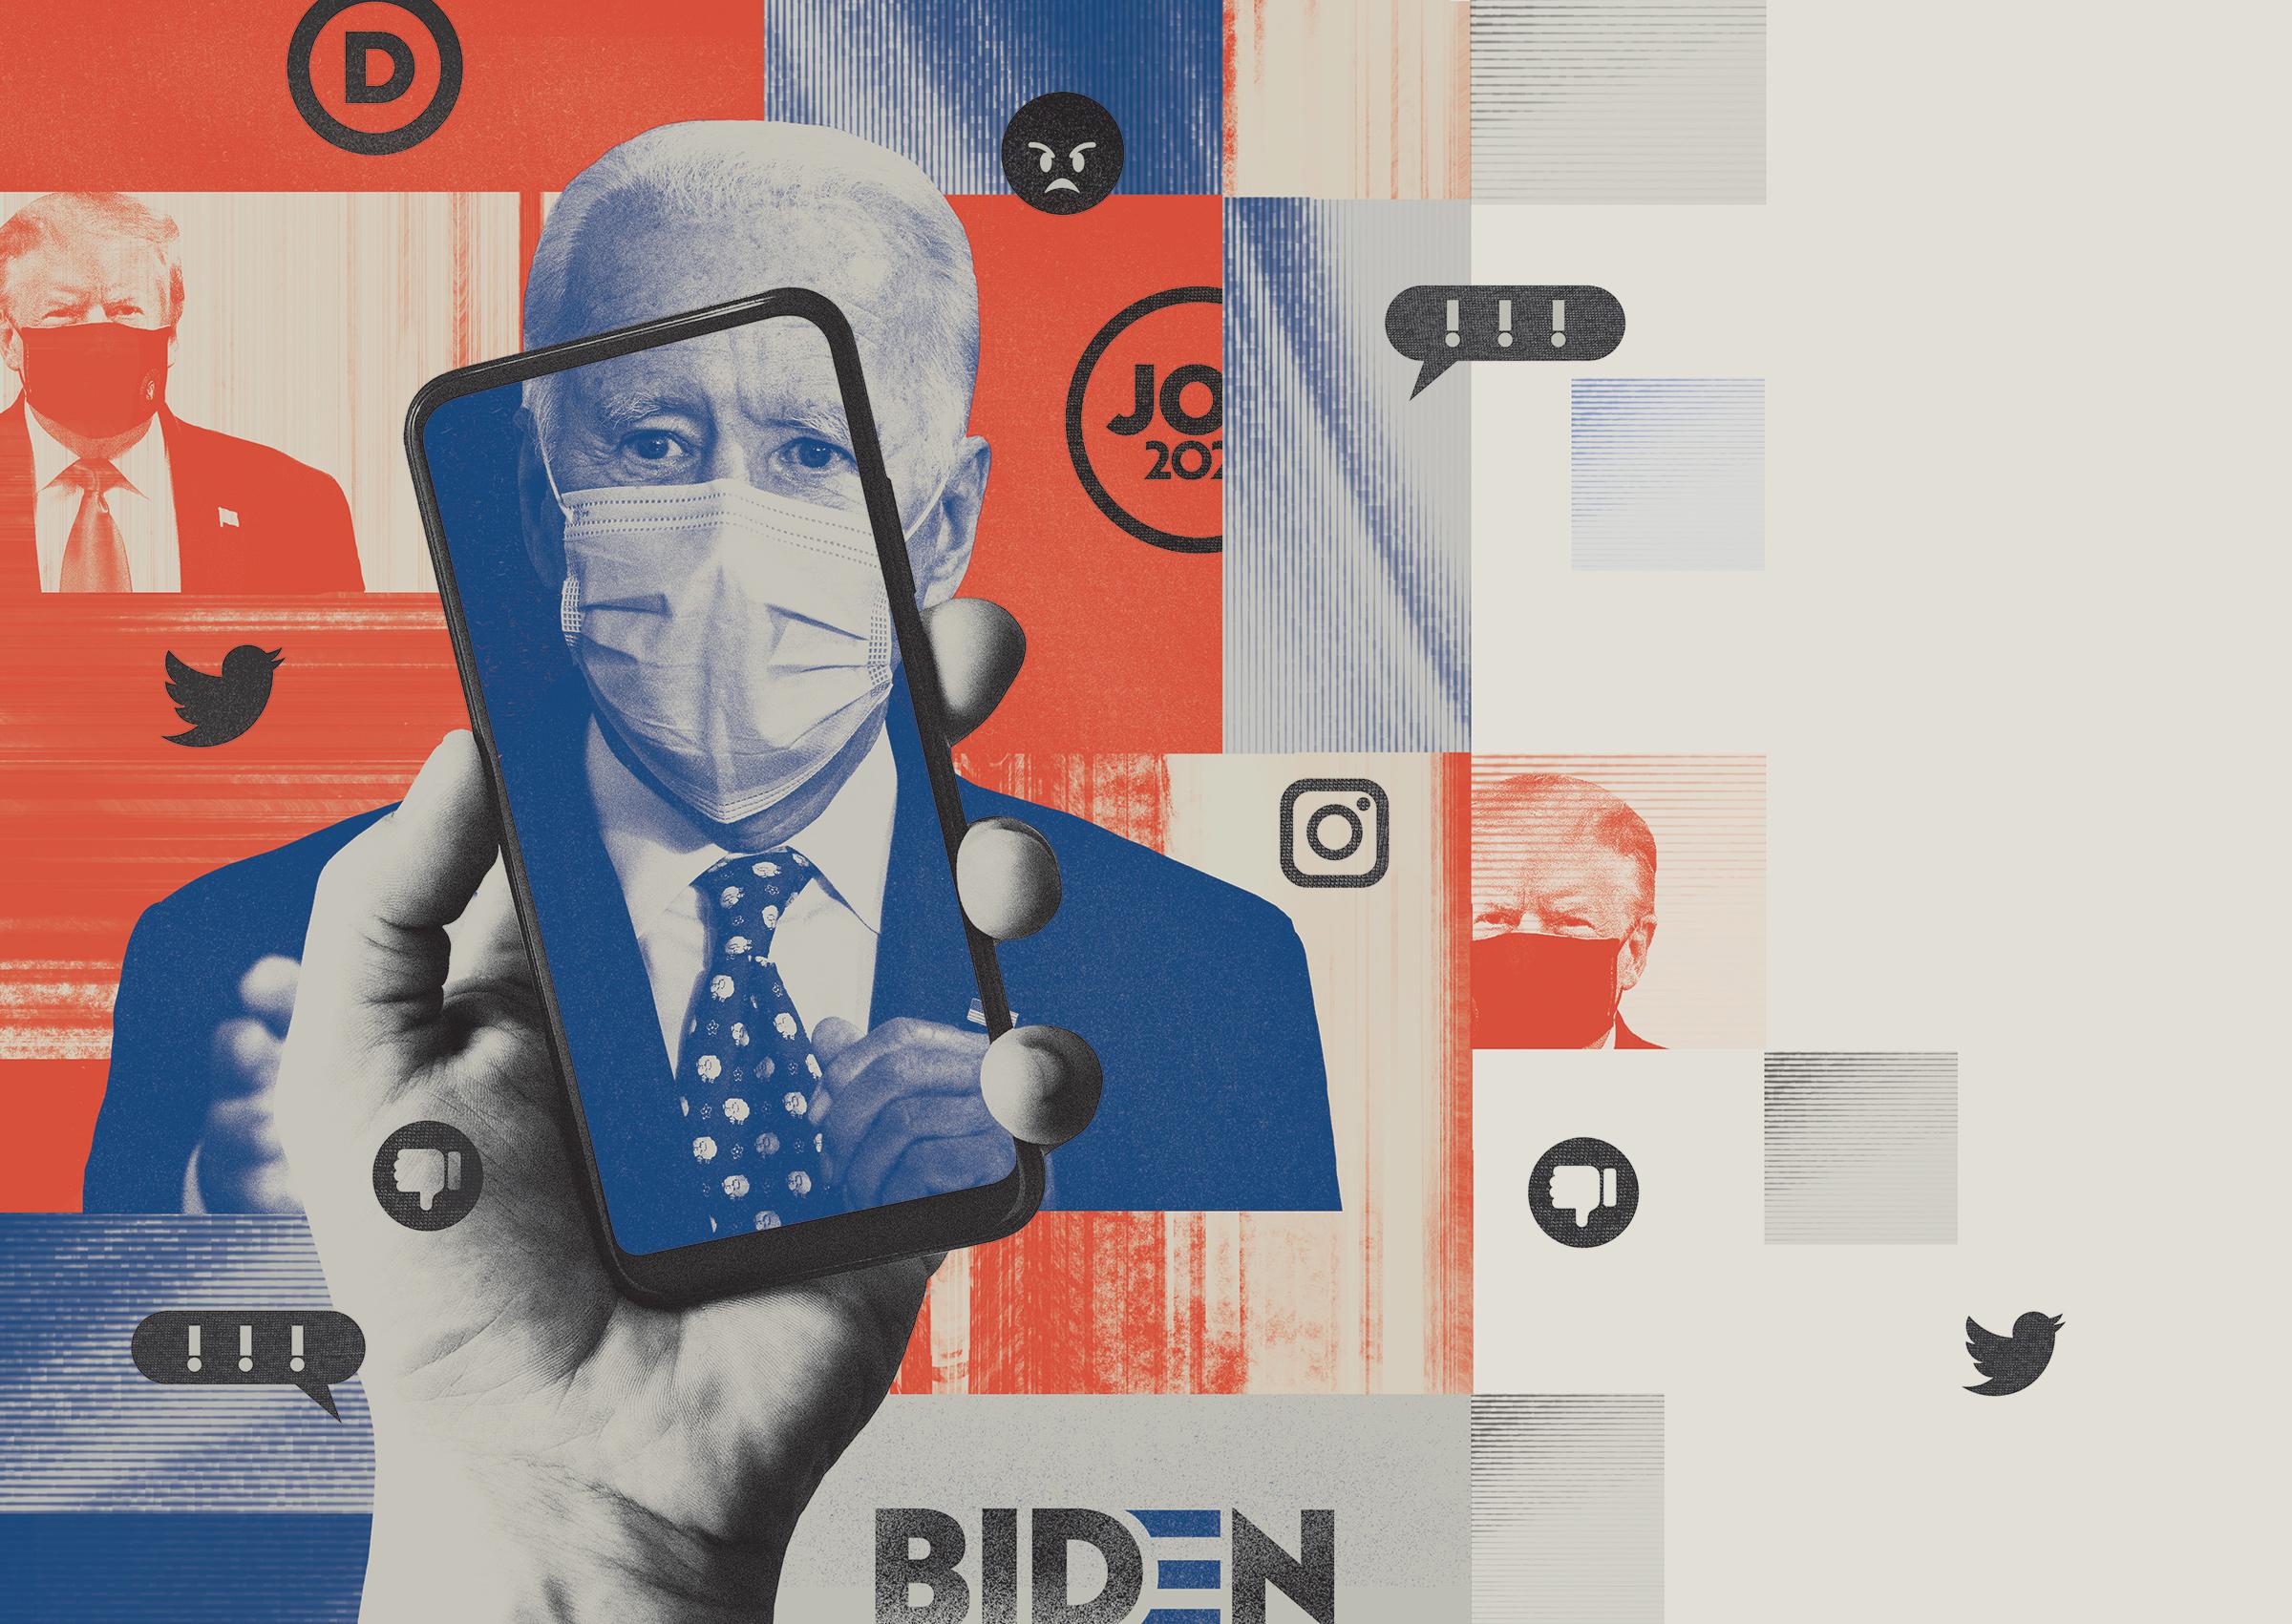 How Joe Biden Democrats Plan To Win Back Internet In 2020 Time